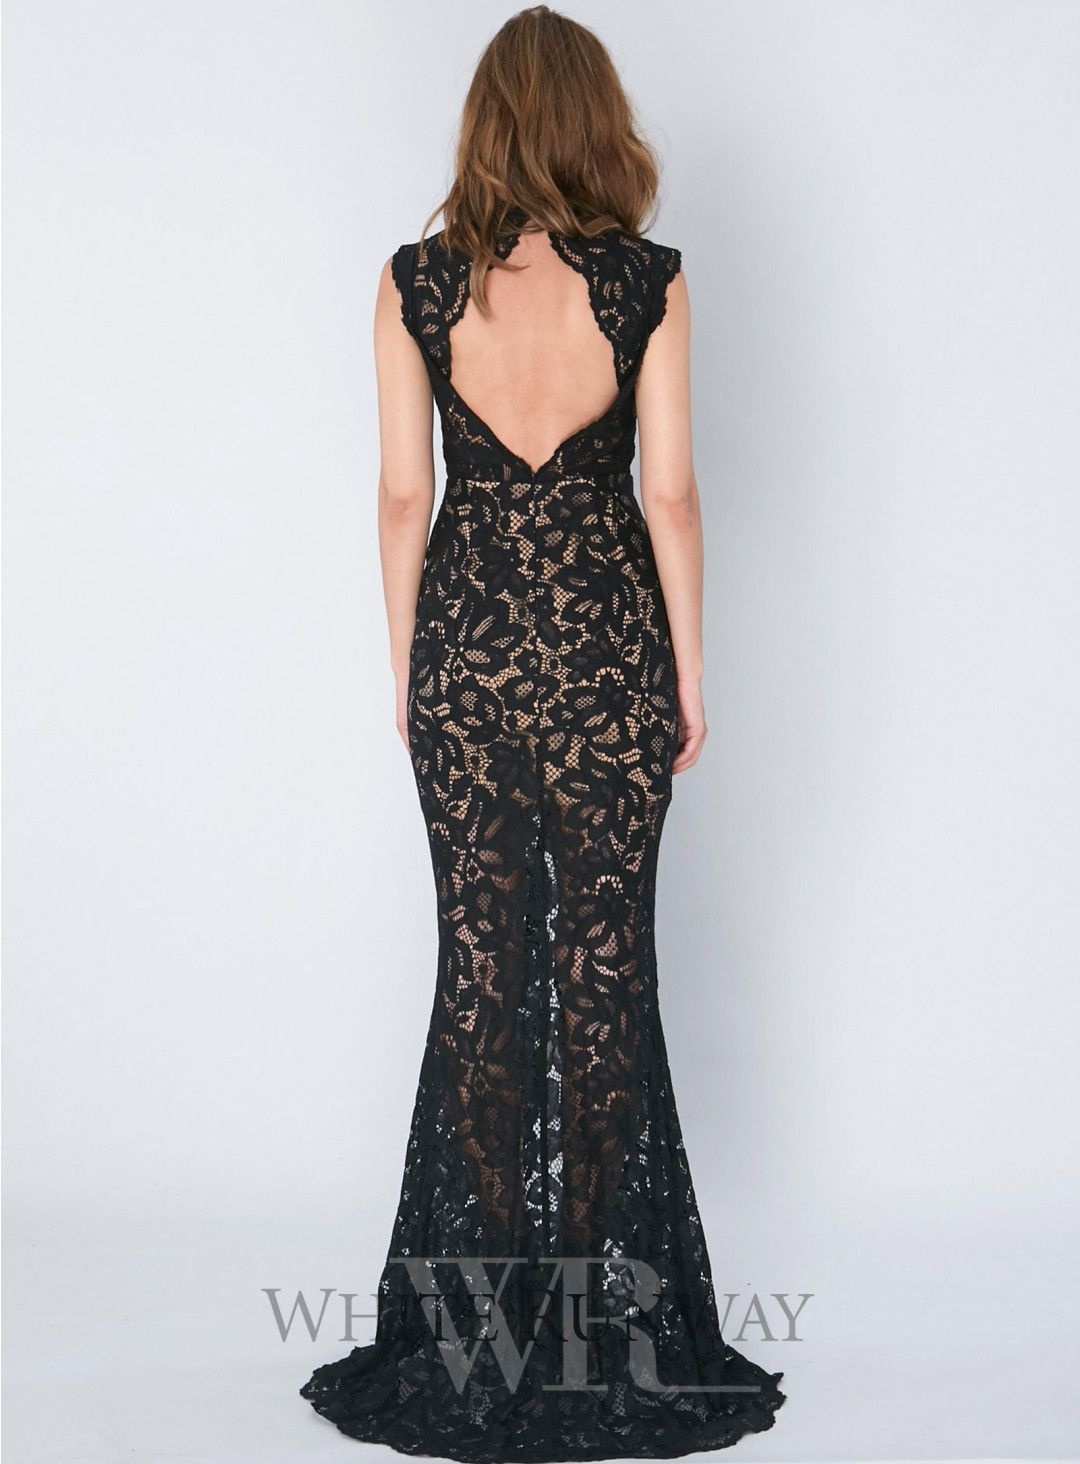 Black Valentine Gown | Stylish Gowns | Pinterest | Full length ...